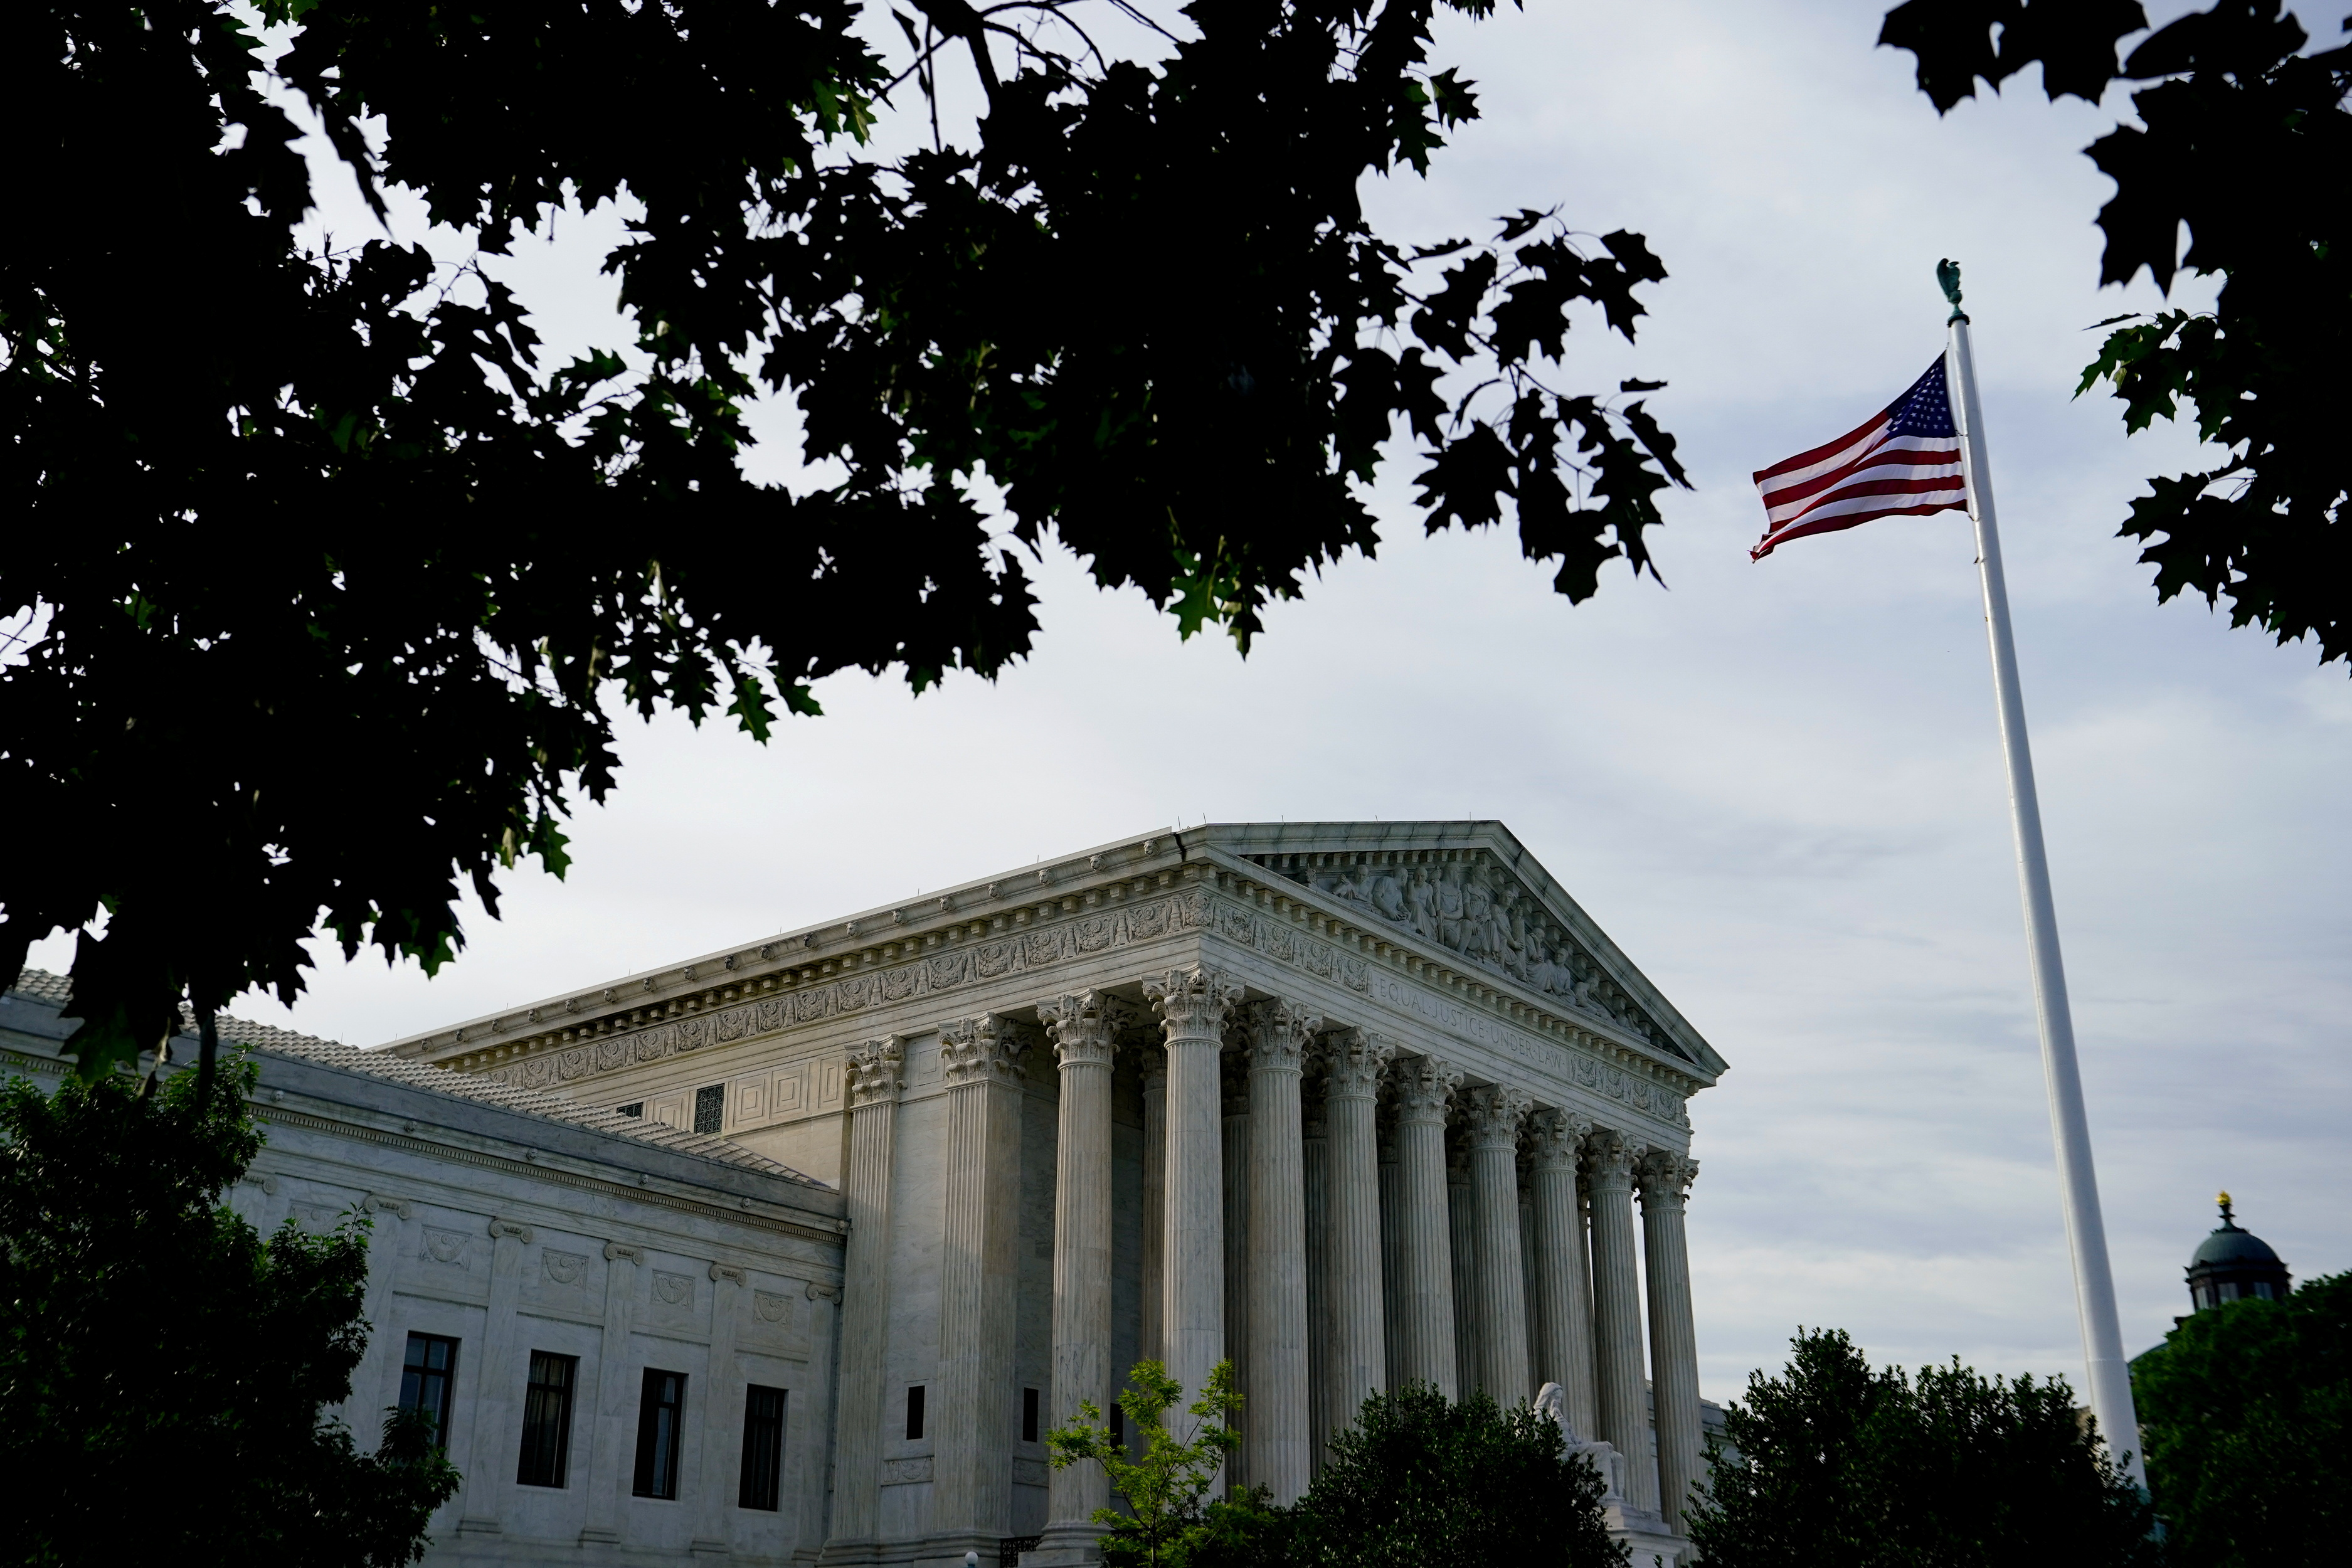 A view of the U.S. Supreme Court in Washington, U.S., June 1, 2021. REUTERS/Erin Scott